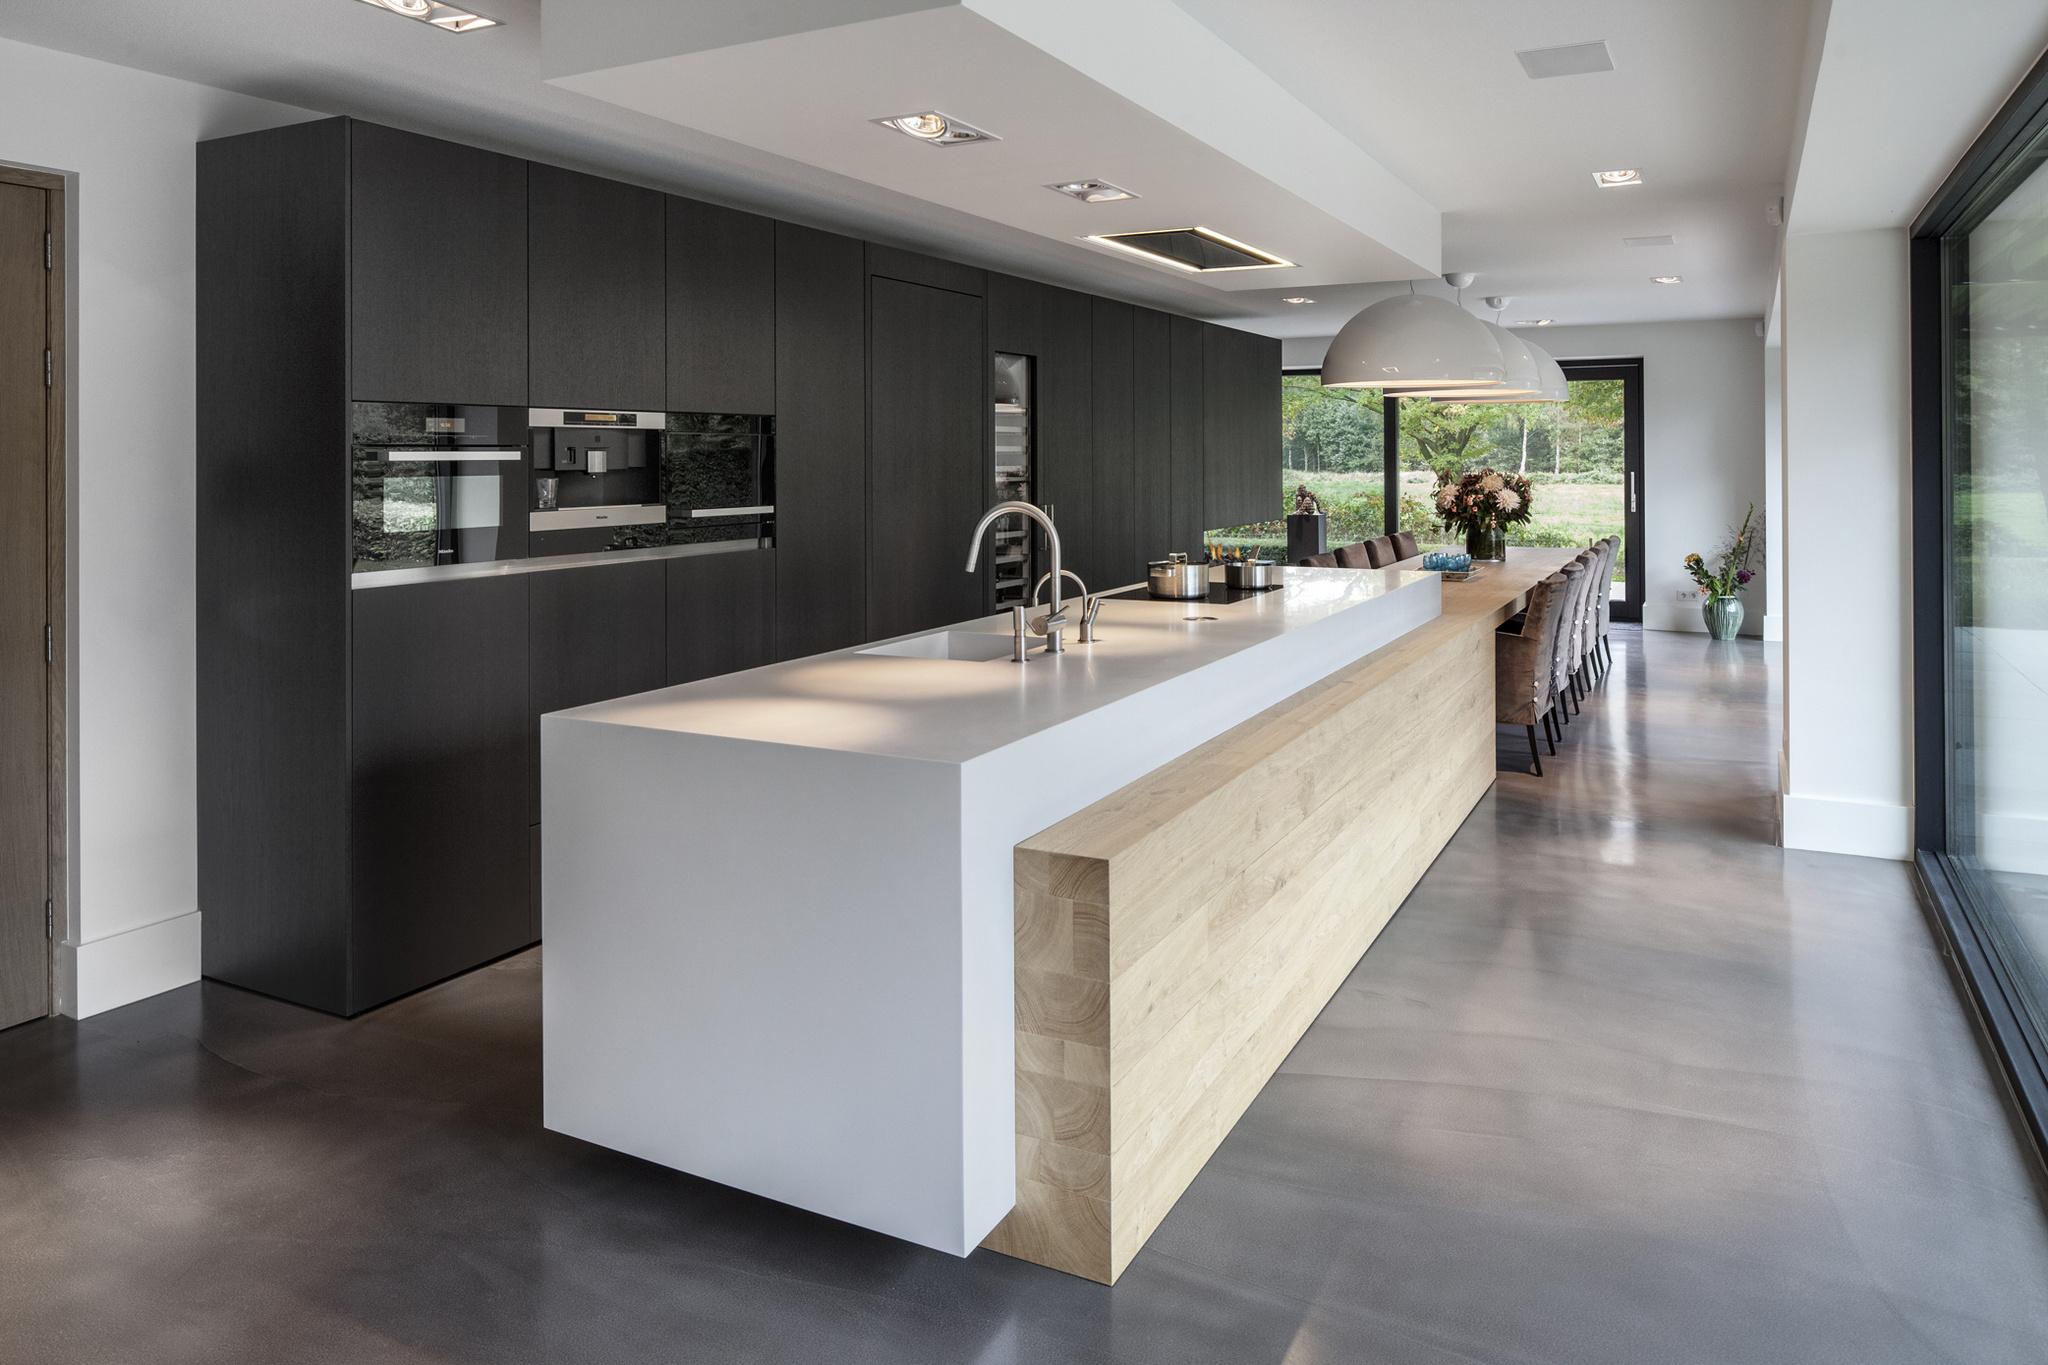 De mooiste moderne keukens alles om van je huis je thuis te